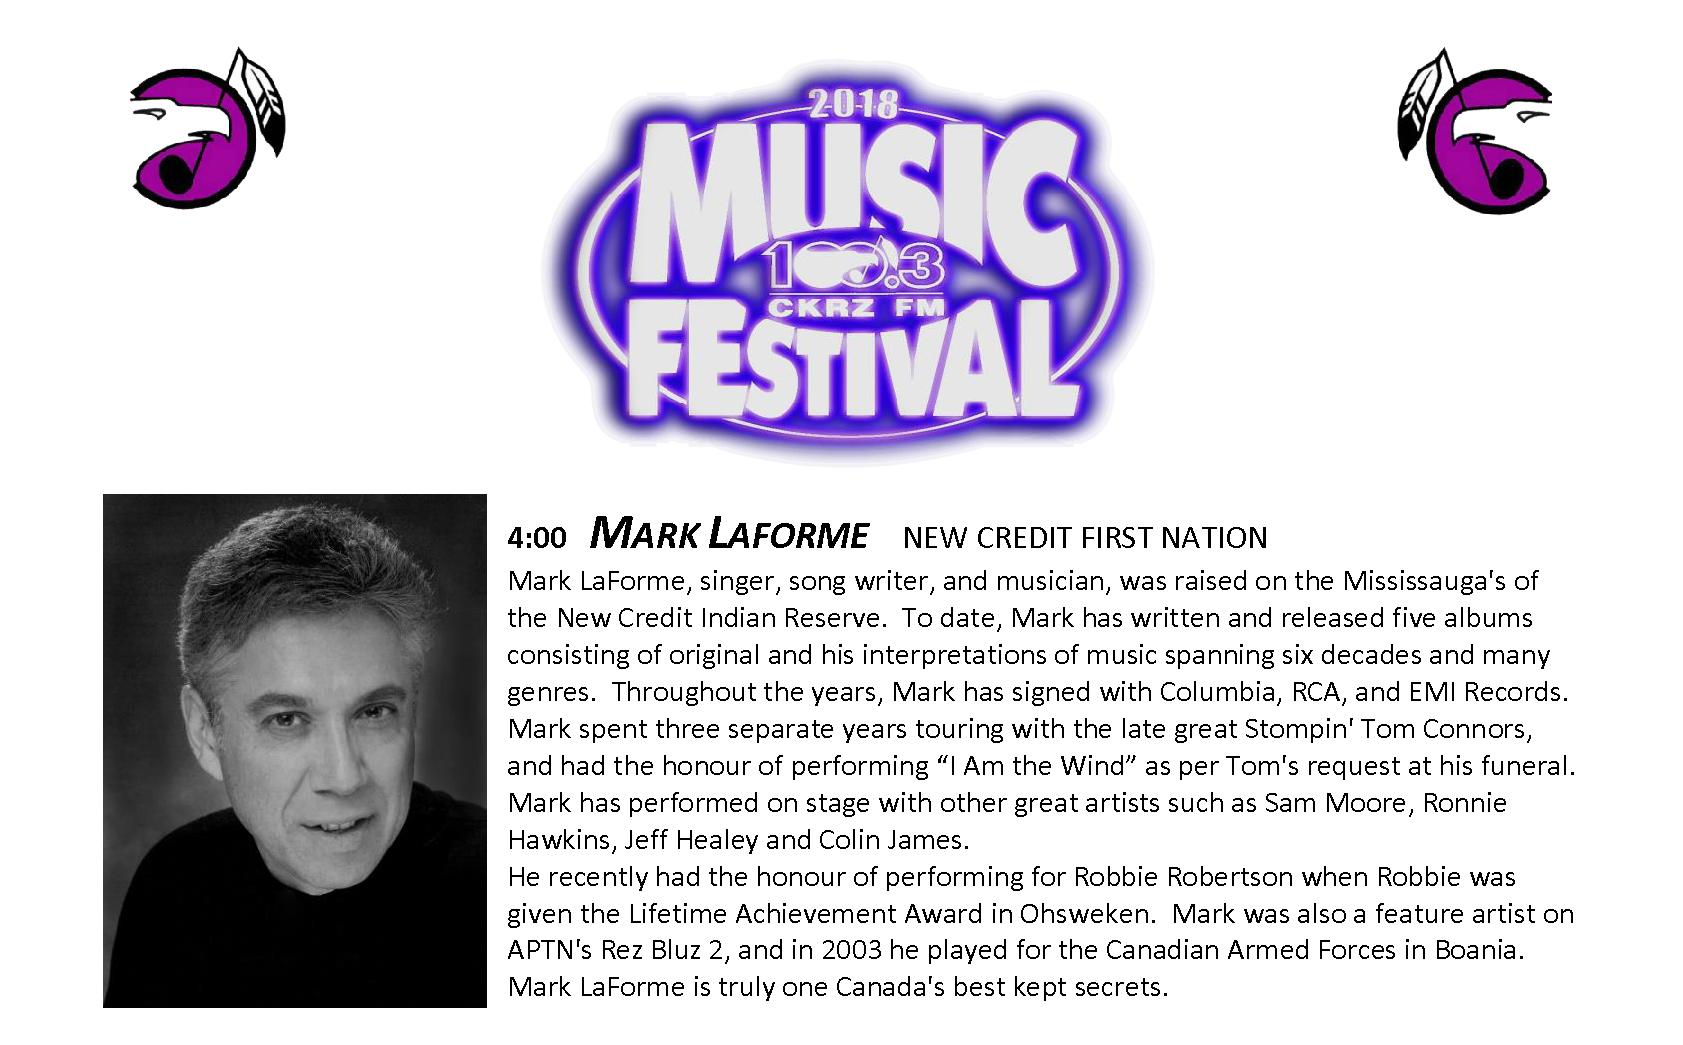 6. Music Fest Lineup - Mark